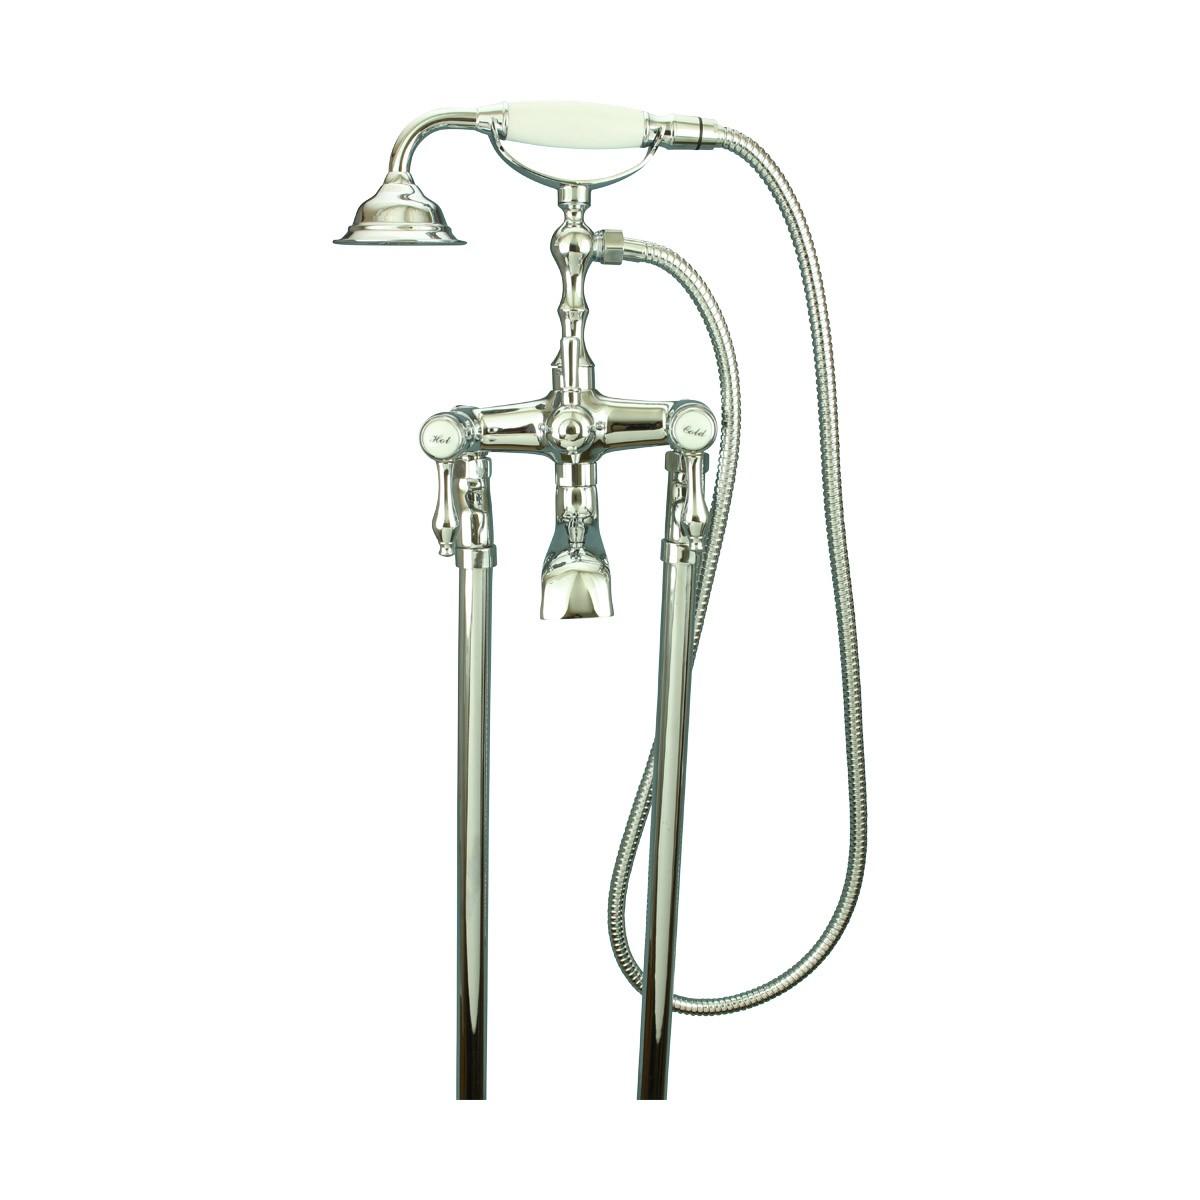 Freestanding Tub Faucet and Telephone Handheld Shower Chrome Faucets Bathroom Faucets Bathroom Sink Faucet